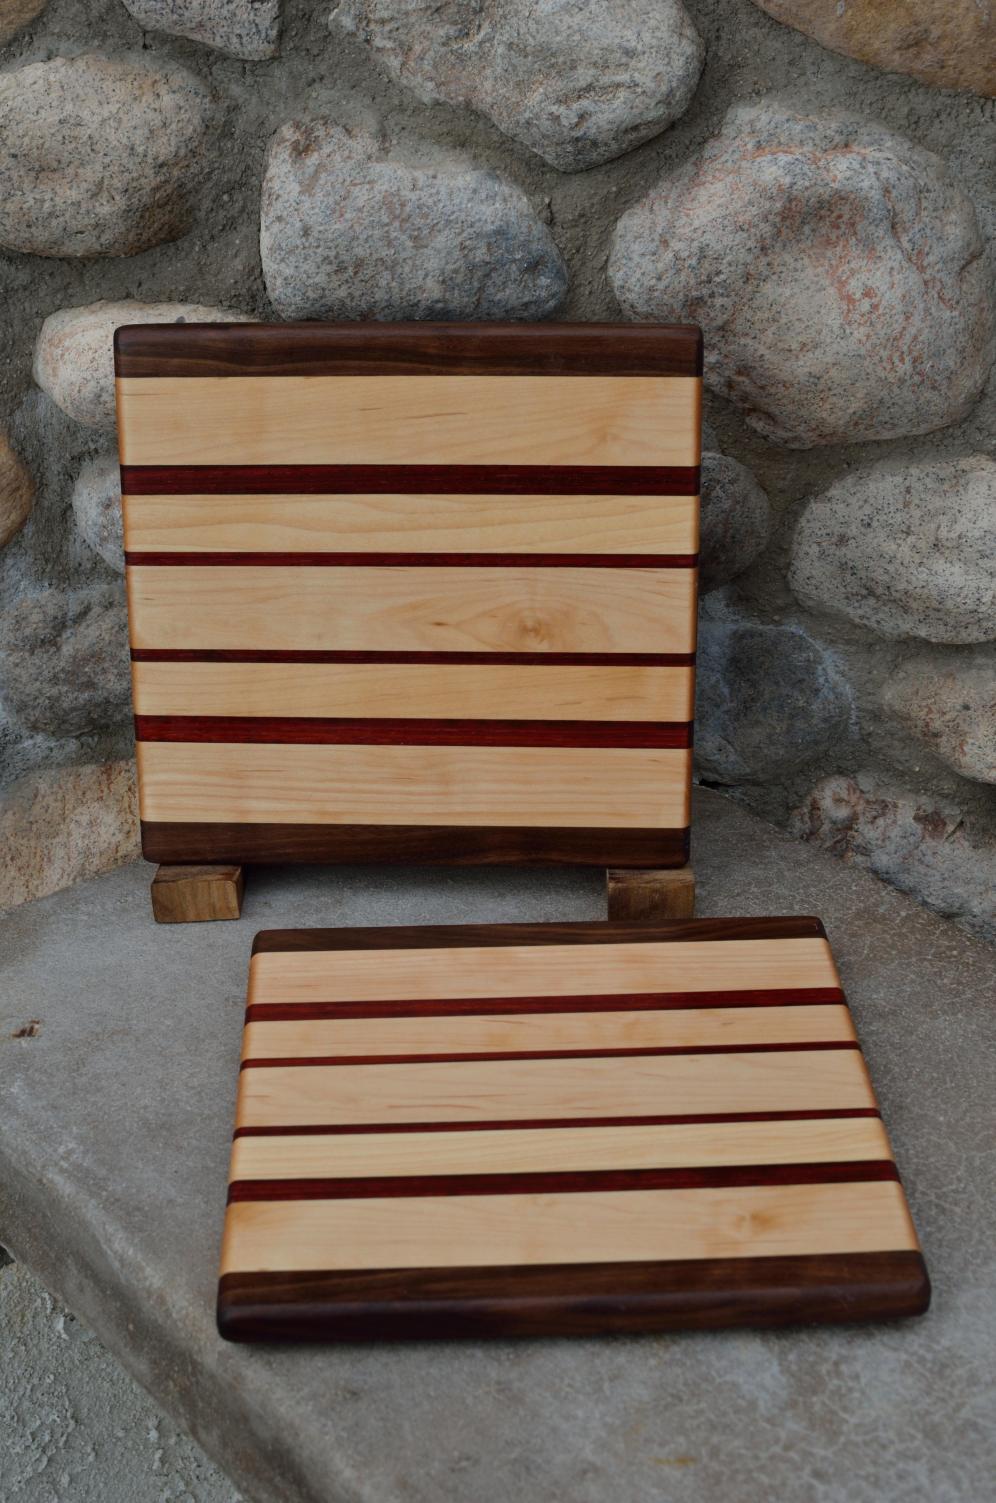 "Cheese Board # 15 - 026. Black Walnut, Hard Maple & Padauk. Edge Grain. 8"" x 10"" x 3/4""."